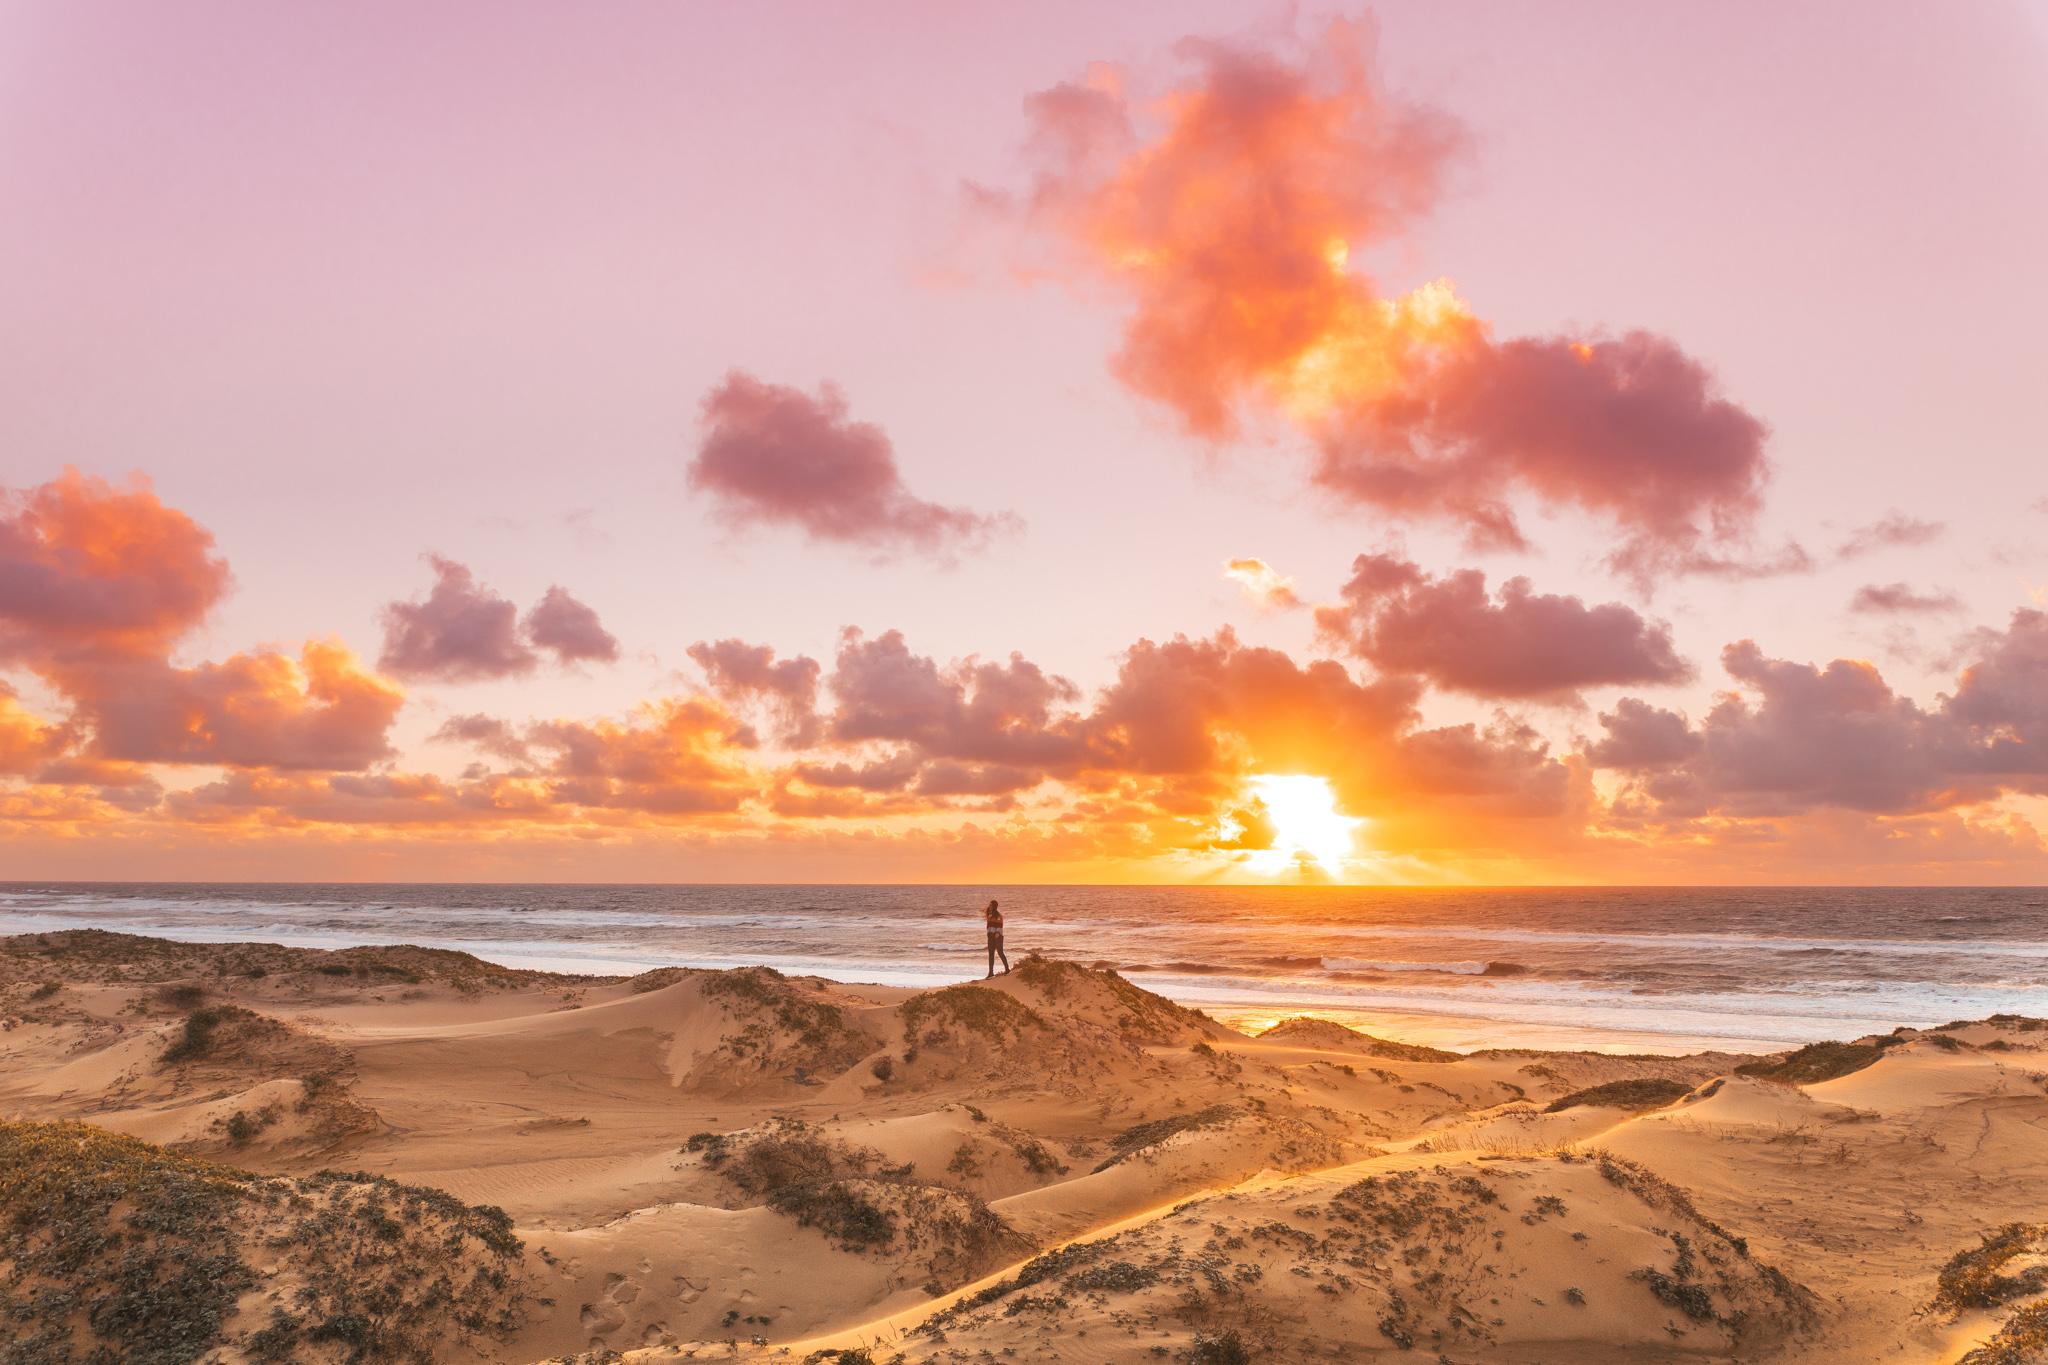 Sunset at Oceano Dunes in Pismo Beach // 5 Adventurous Things to Do in San Luis Obispo County #readysetjetset #slocal #travel #blogpost #adventuretravel #california #westcoast